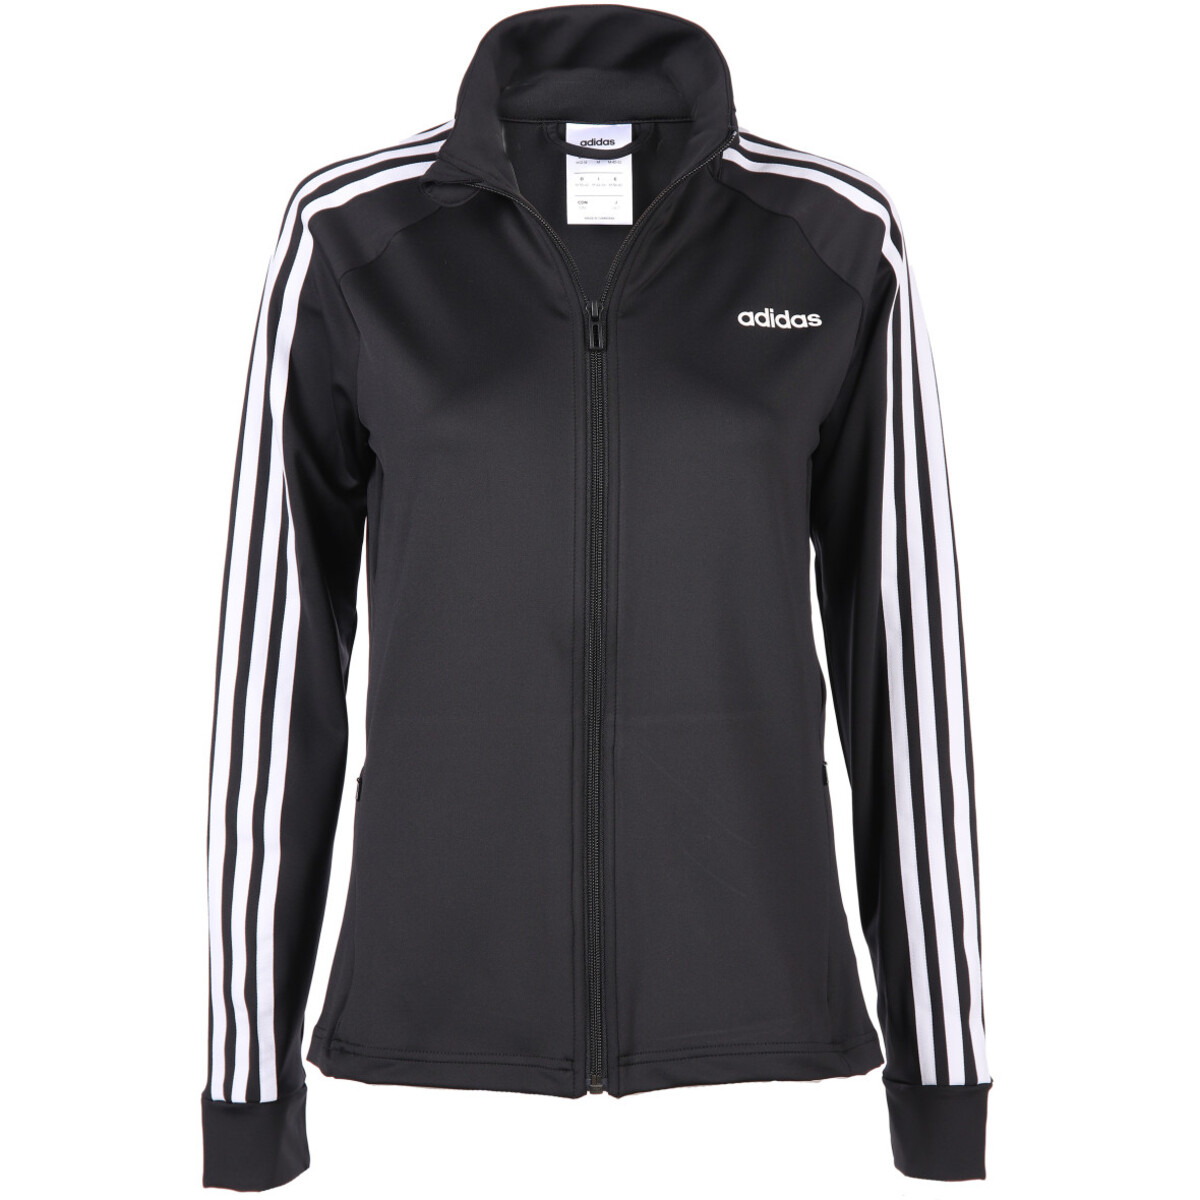 Bild 1 von Damen Trainingsjacke